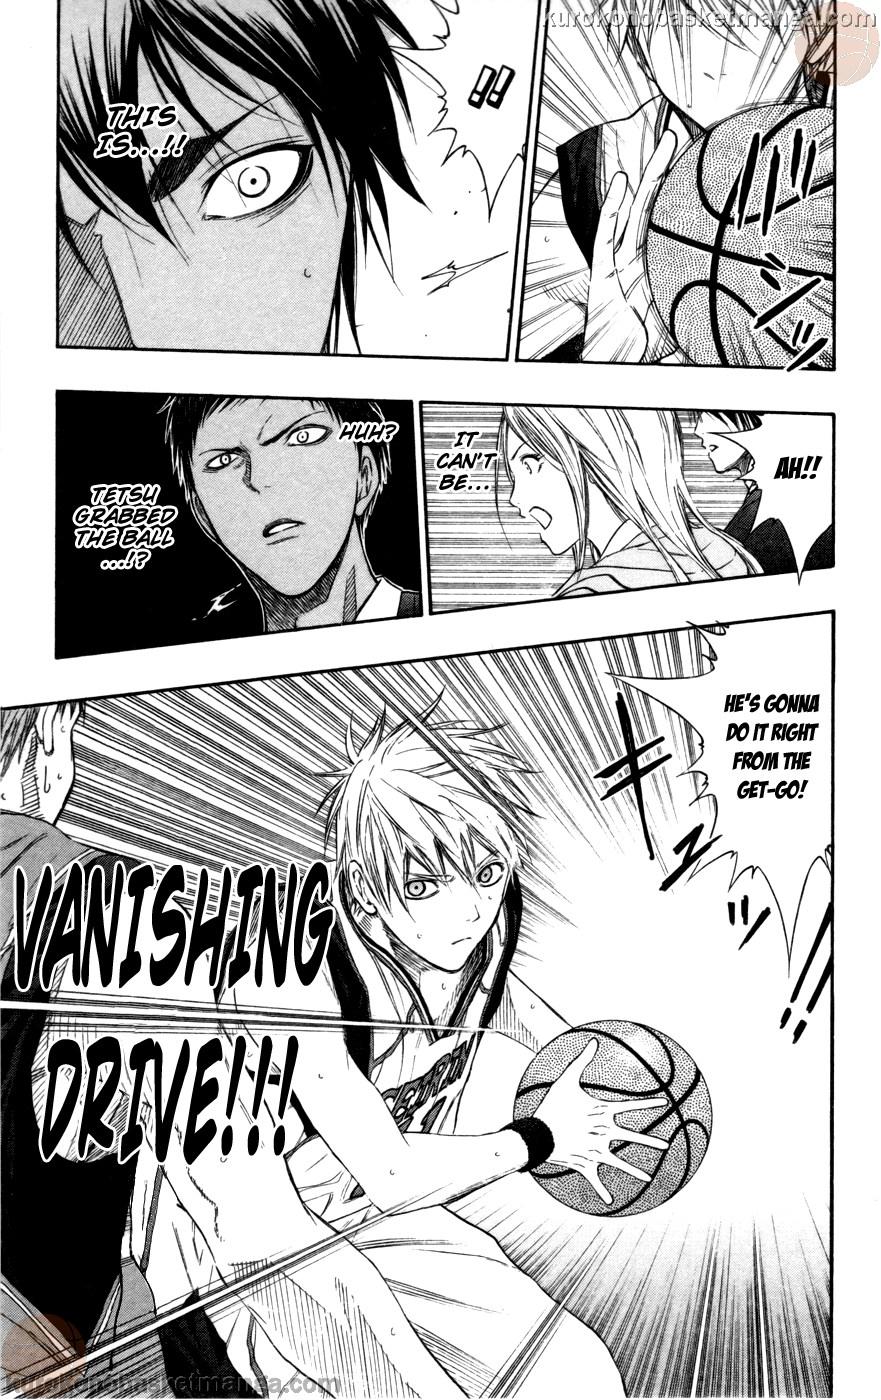 Kuroko no Basket Manga Chapter 100 - Image 23